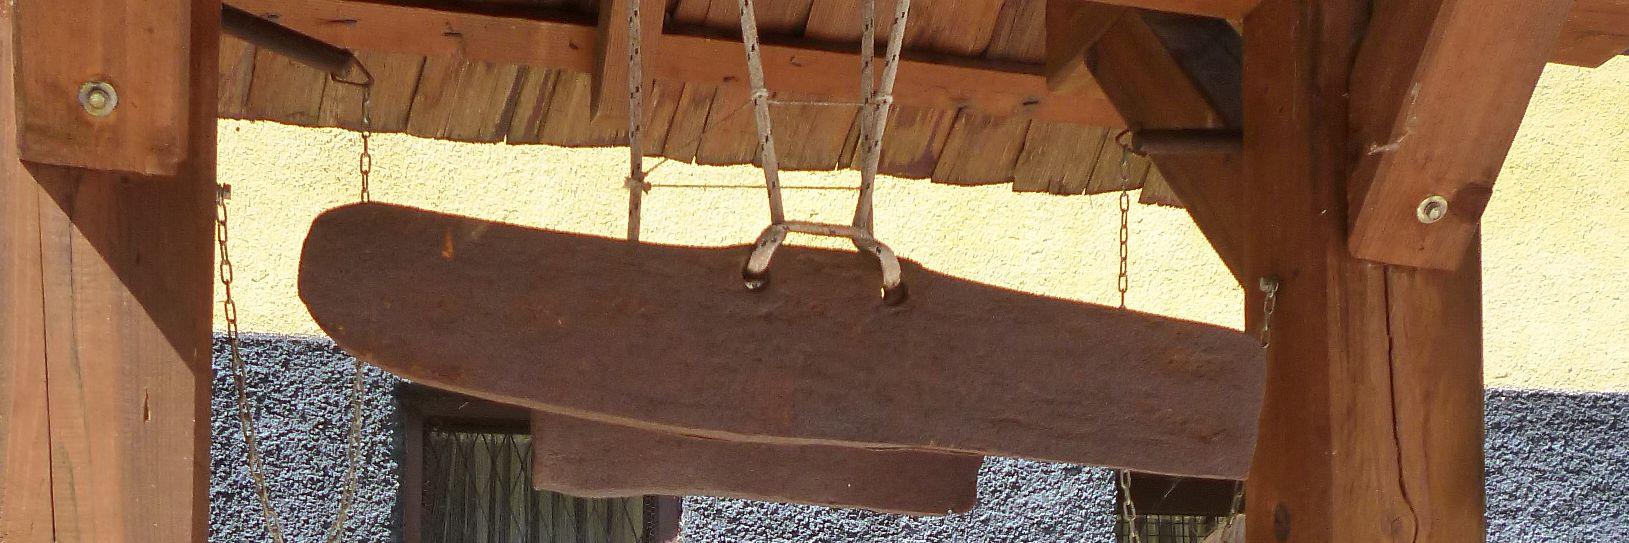 Боснийский колокол или та'те